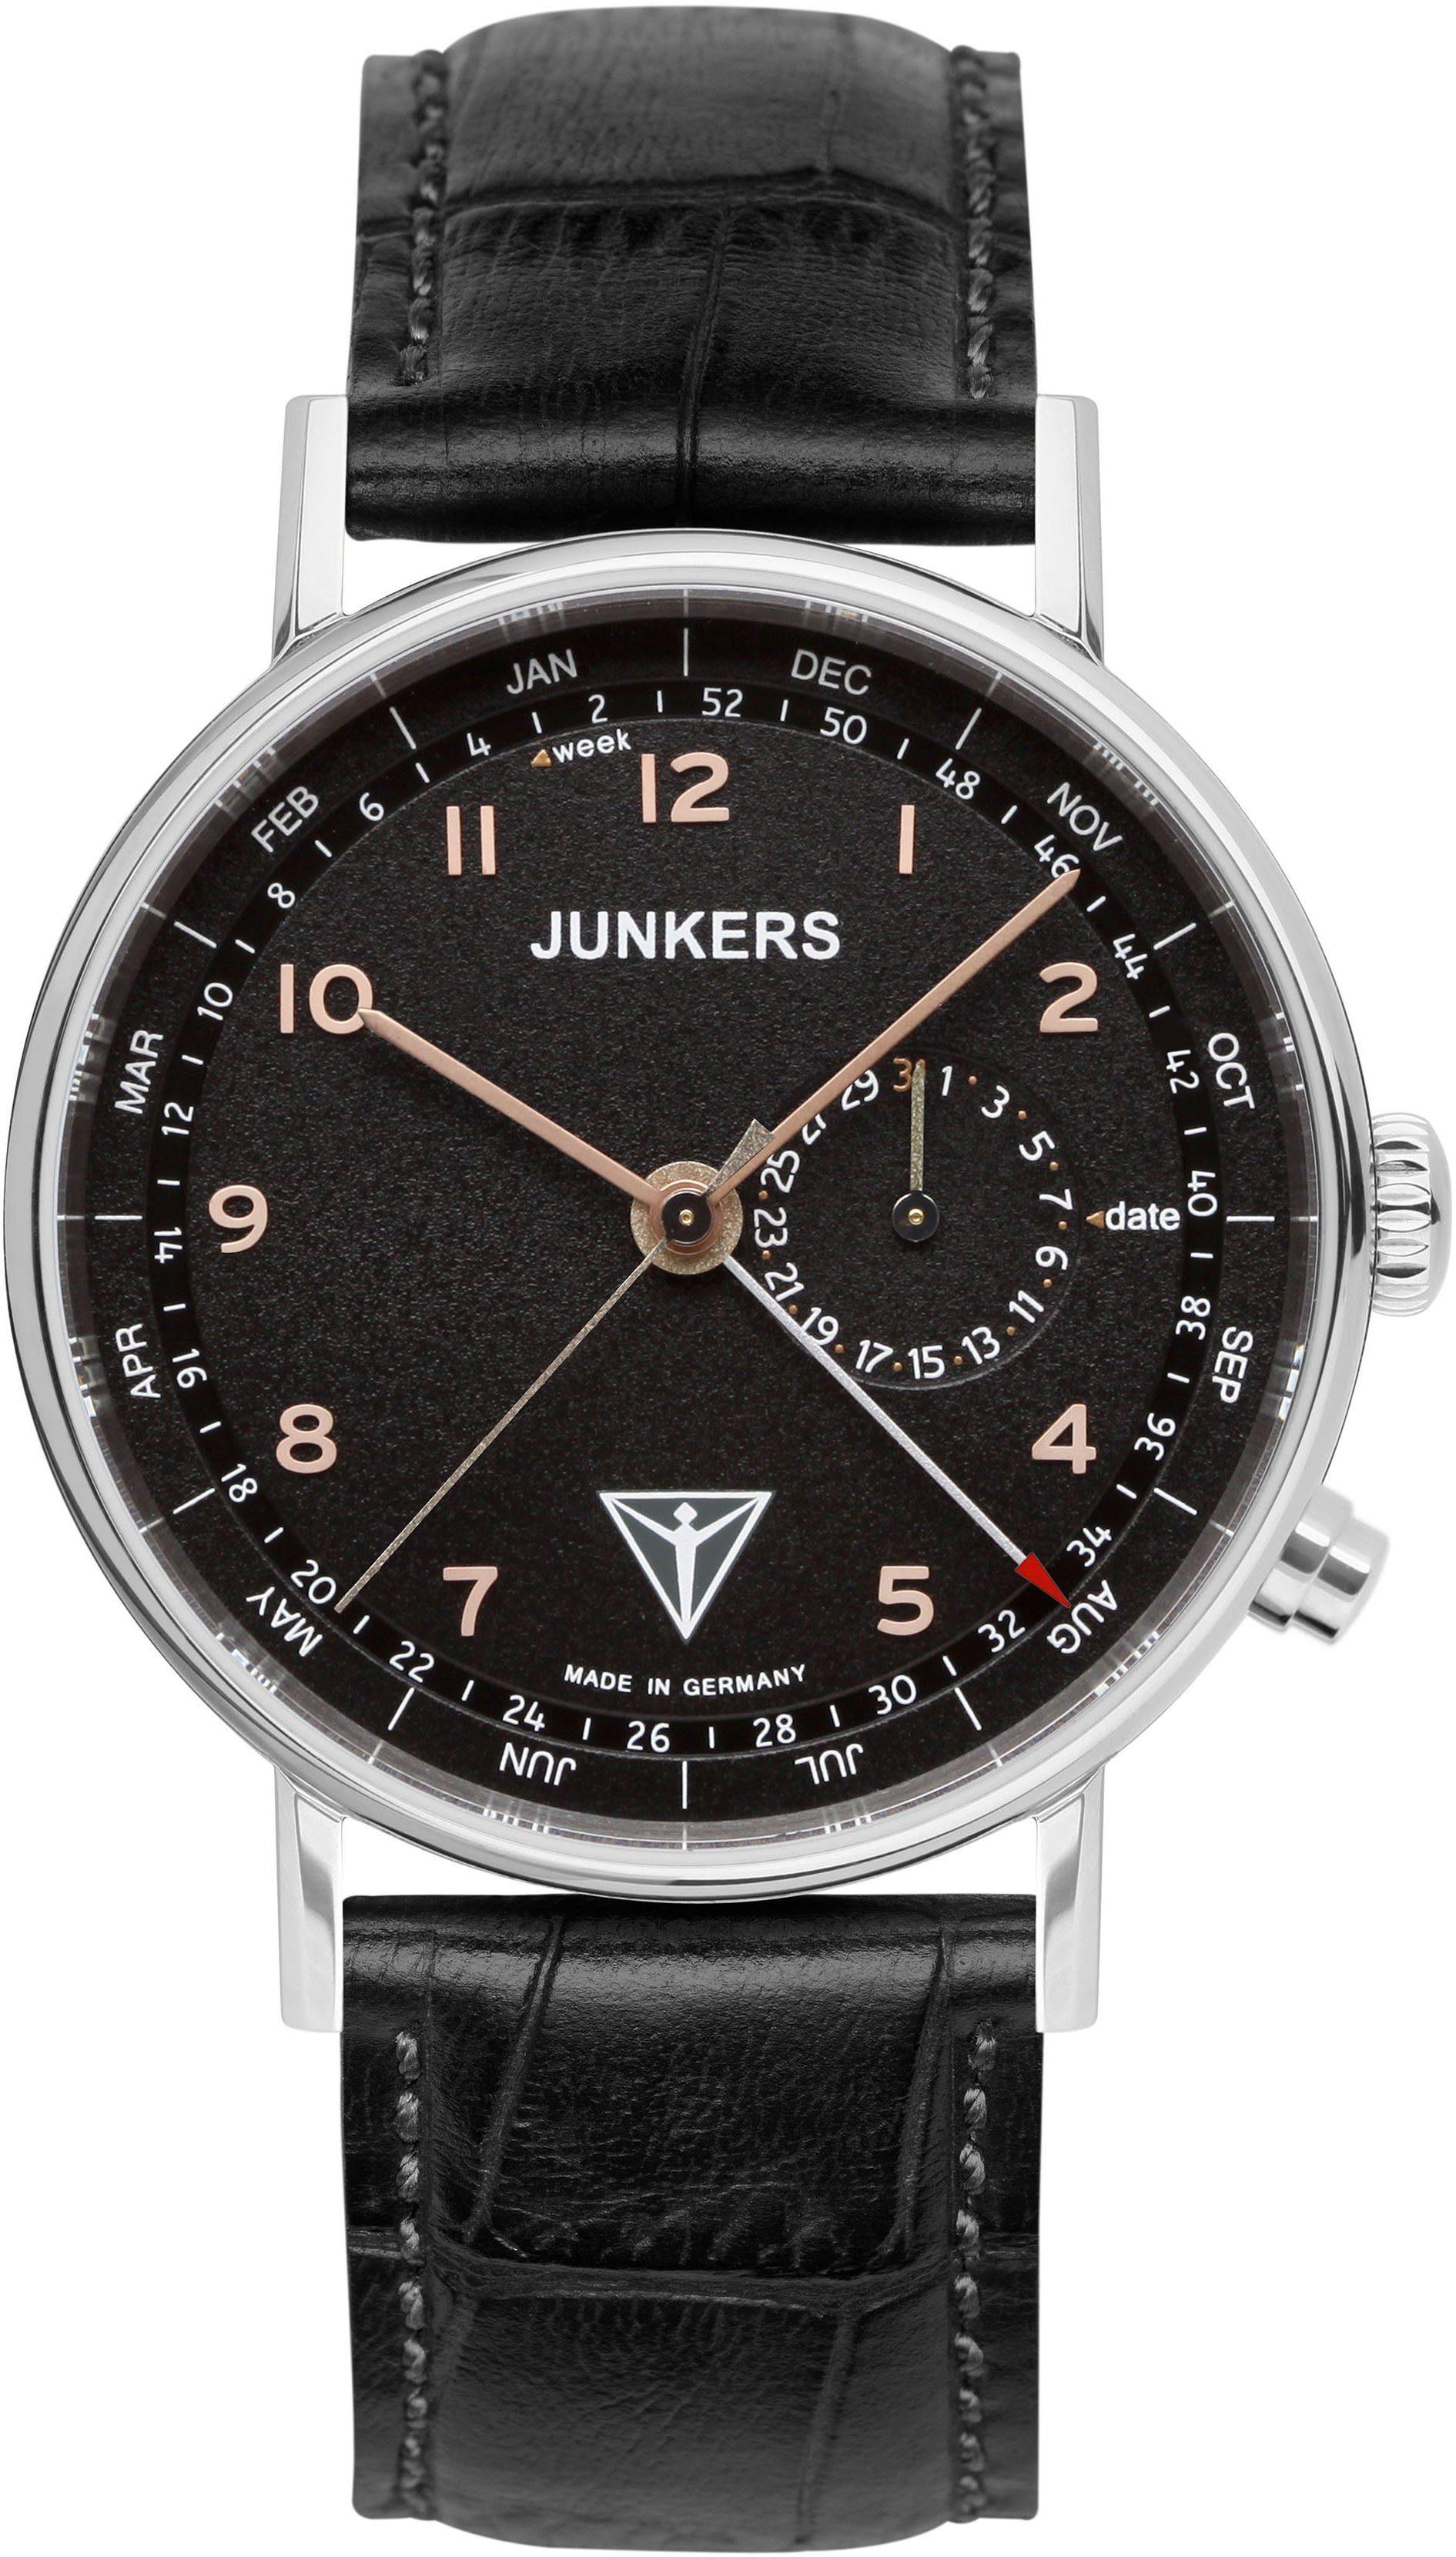 Junkers-Uhren Quarzuhr »EISVOGEL F13, 6734-5« Made in Germany